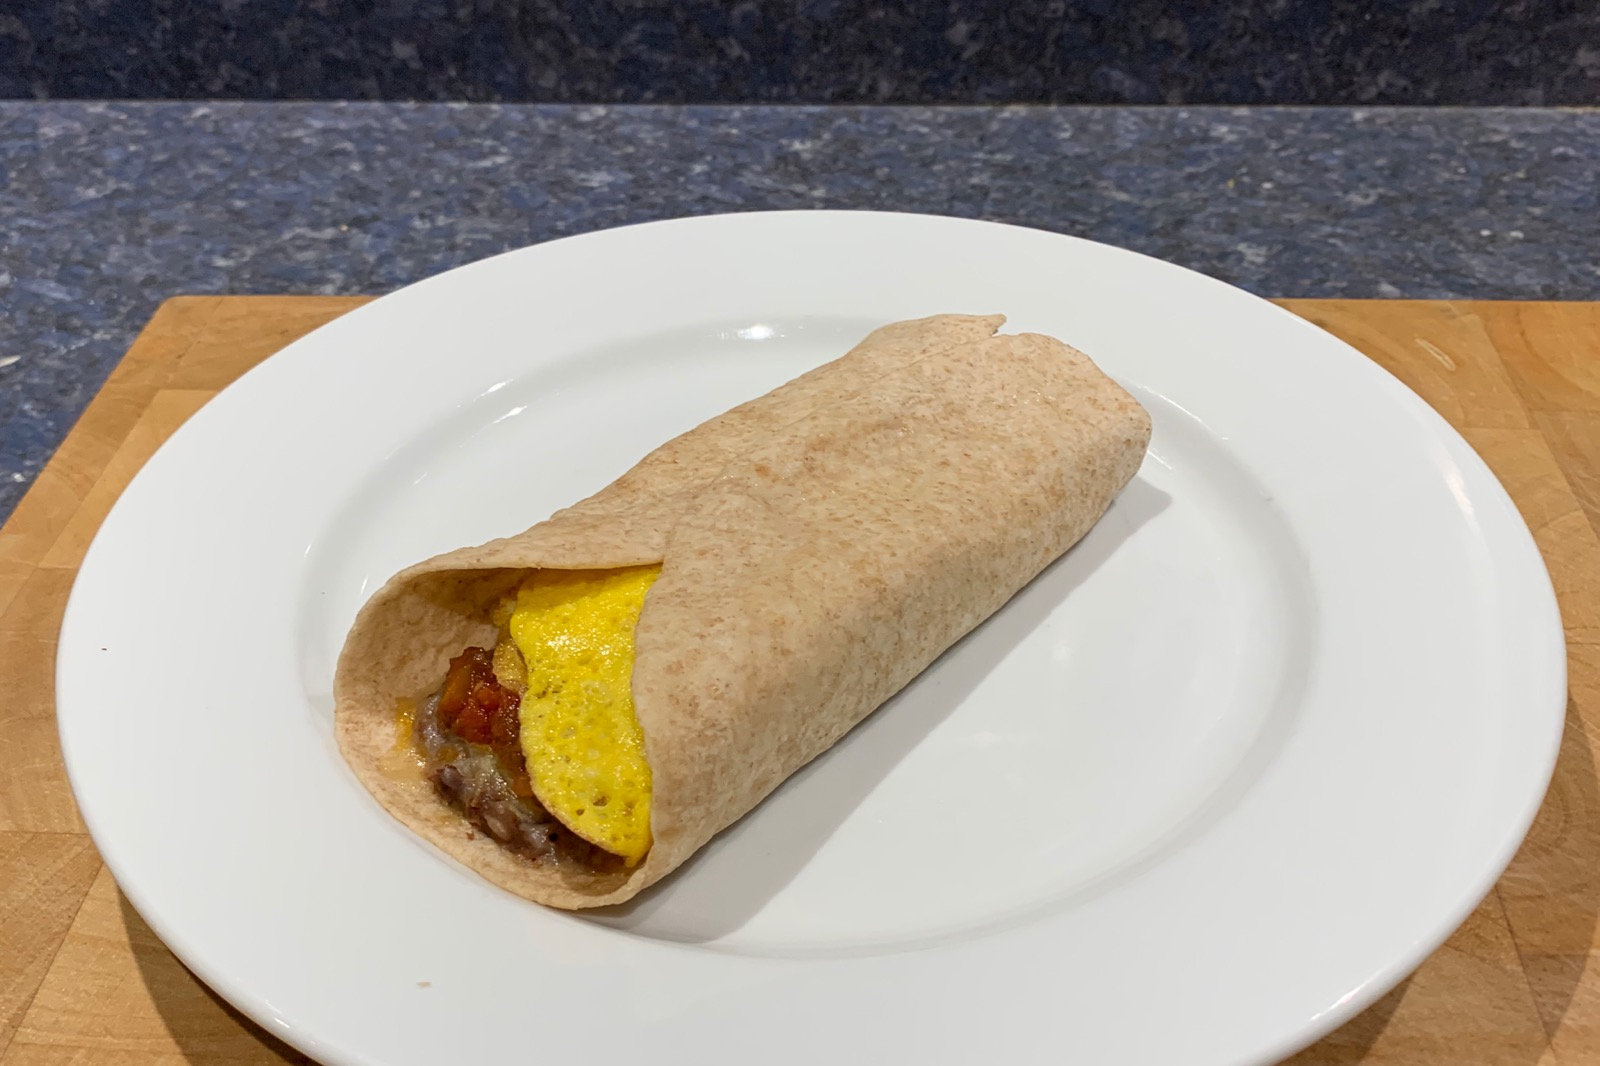 http://blog.rickk.com/food/2020/02/08/ate.2020.02.08.b.jpg